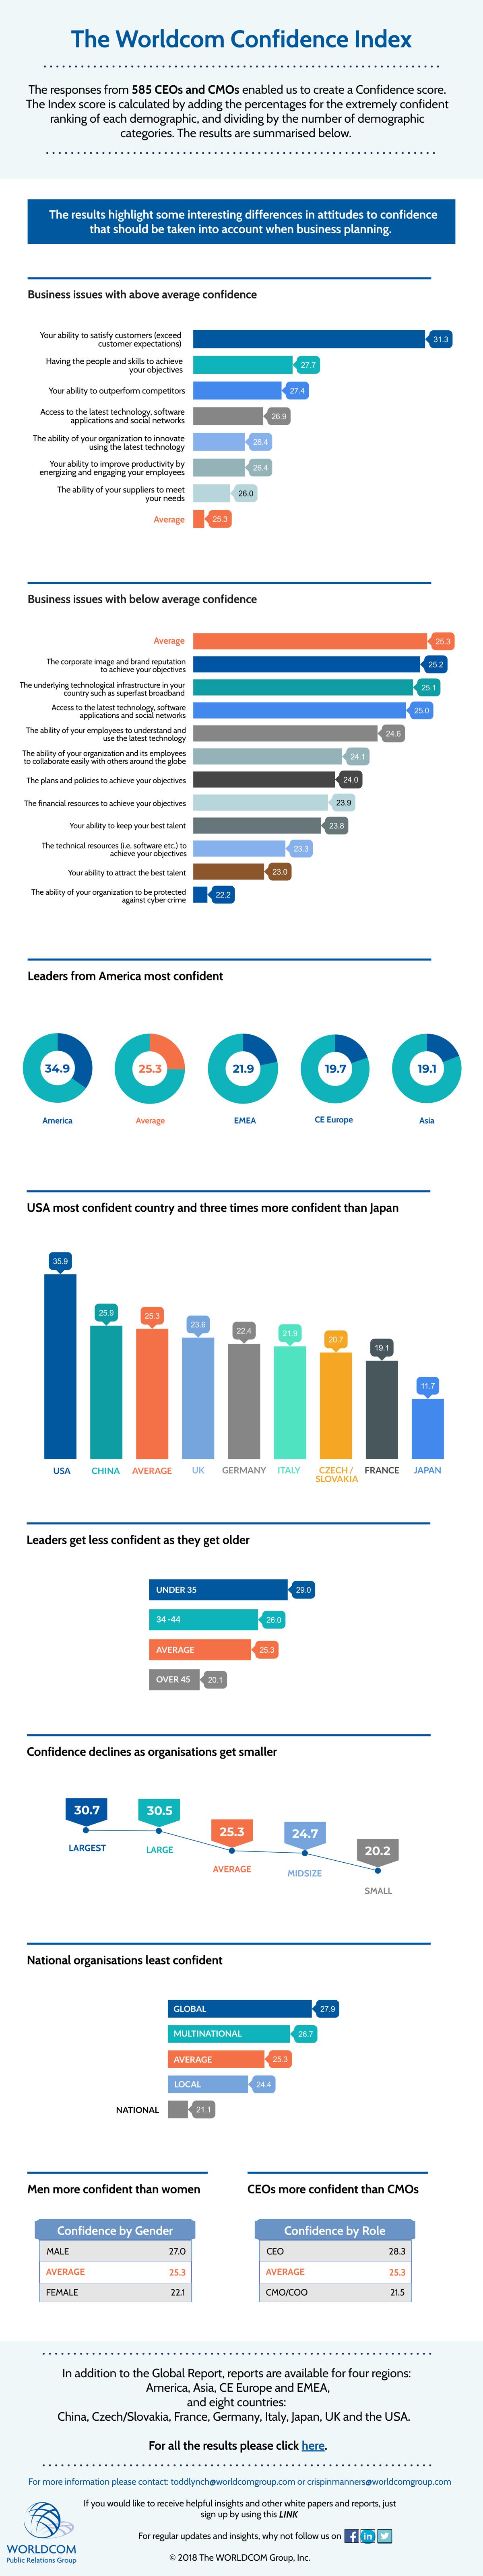 Výsledky výzkumu Worldcom Confidence Index 2018